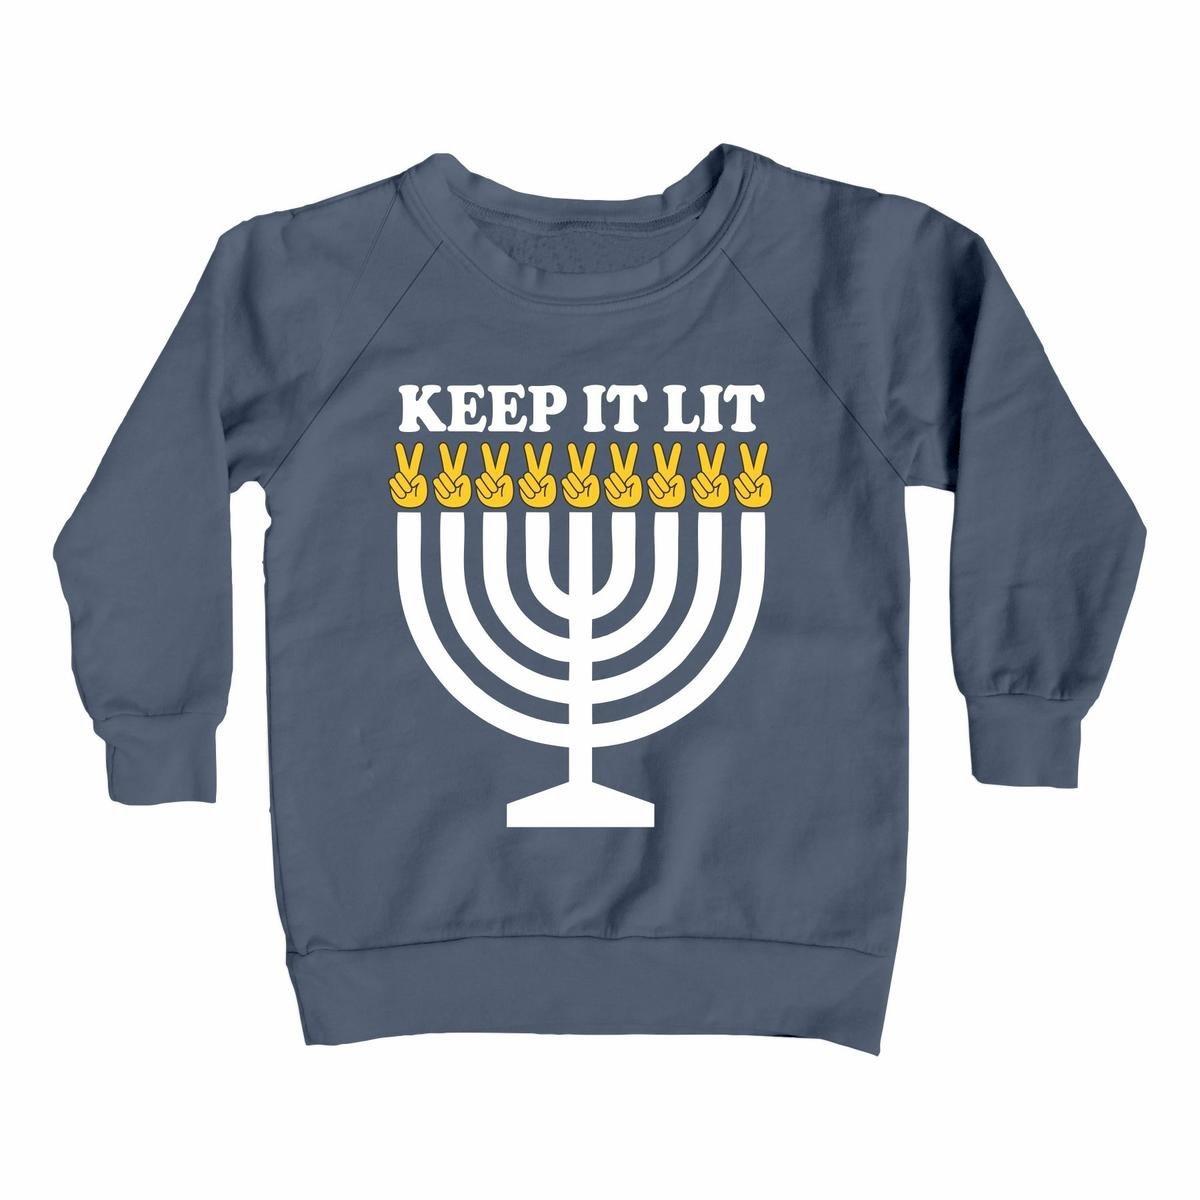 TINY WHALES Keep It Lit Sweatshirt